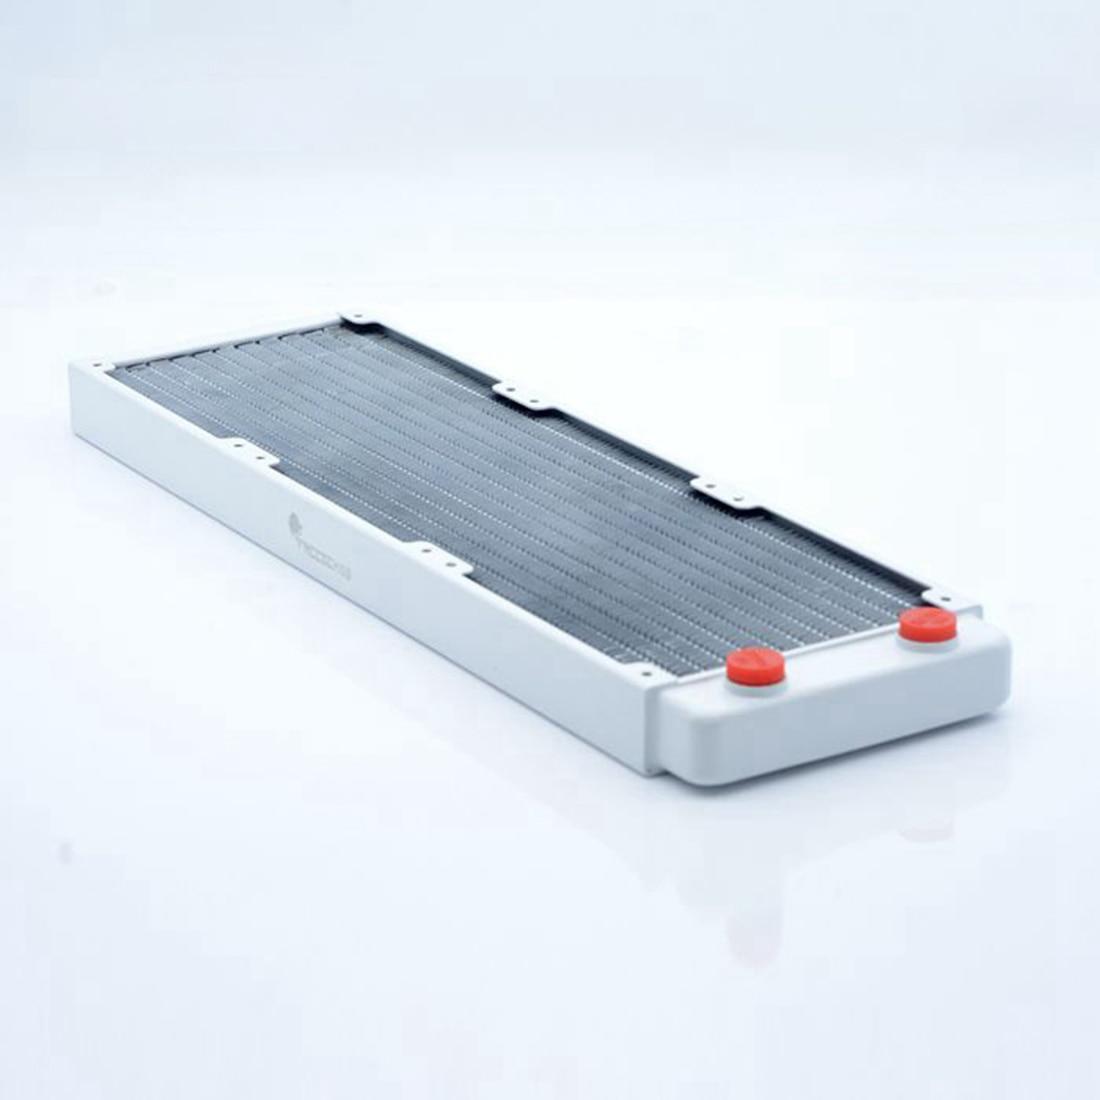 FREEZEMOD CPU الحرارة بالوعة الكمبيوتر مبرد ماء مسند تبريد للاب توب مدمج به مكبر صوت الوسادة للكمبيوتر-أبيض (TSRP-WP-360MM /240 مللي متر/120 مللي متر)